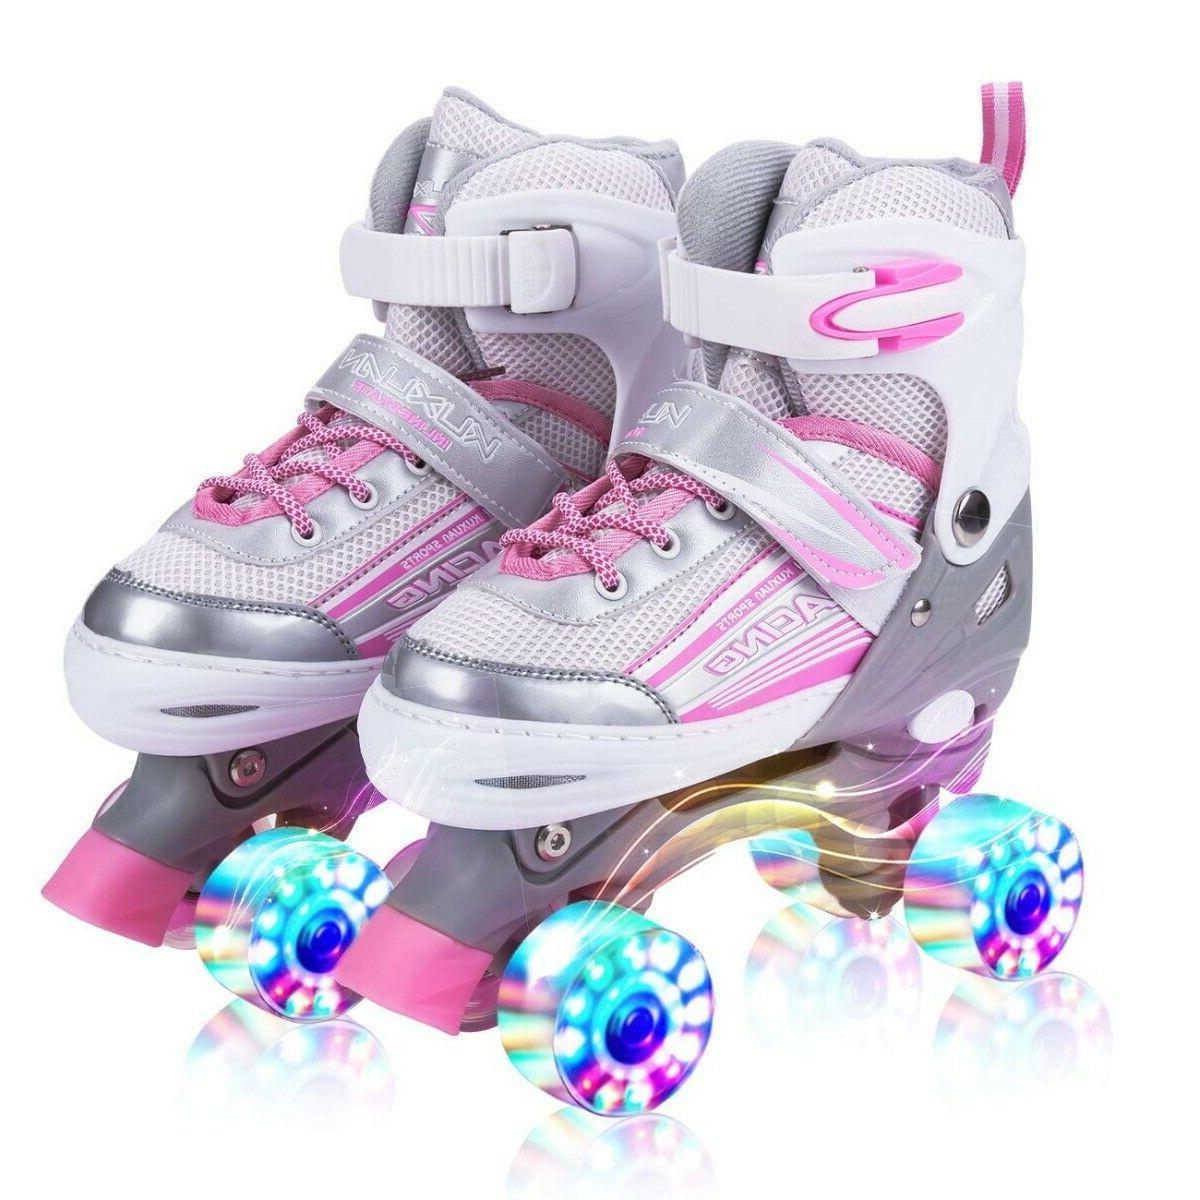 saya pink gray roller skates adjustable